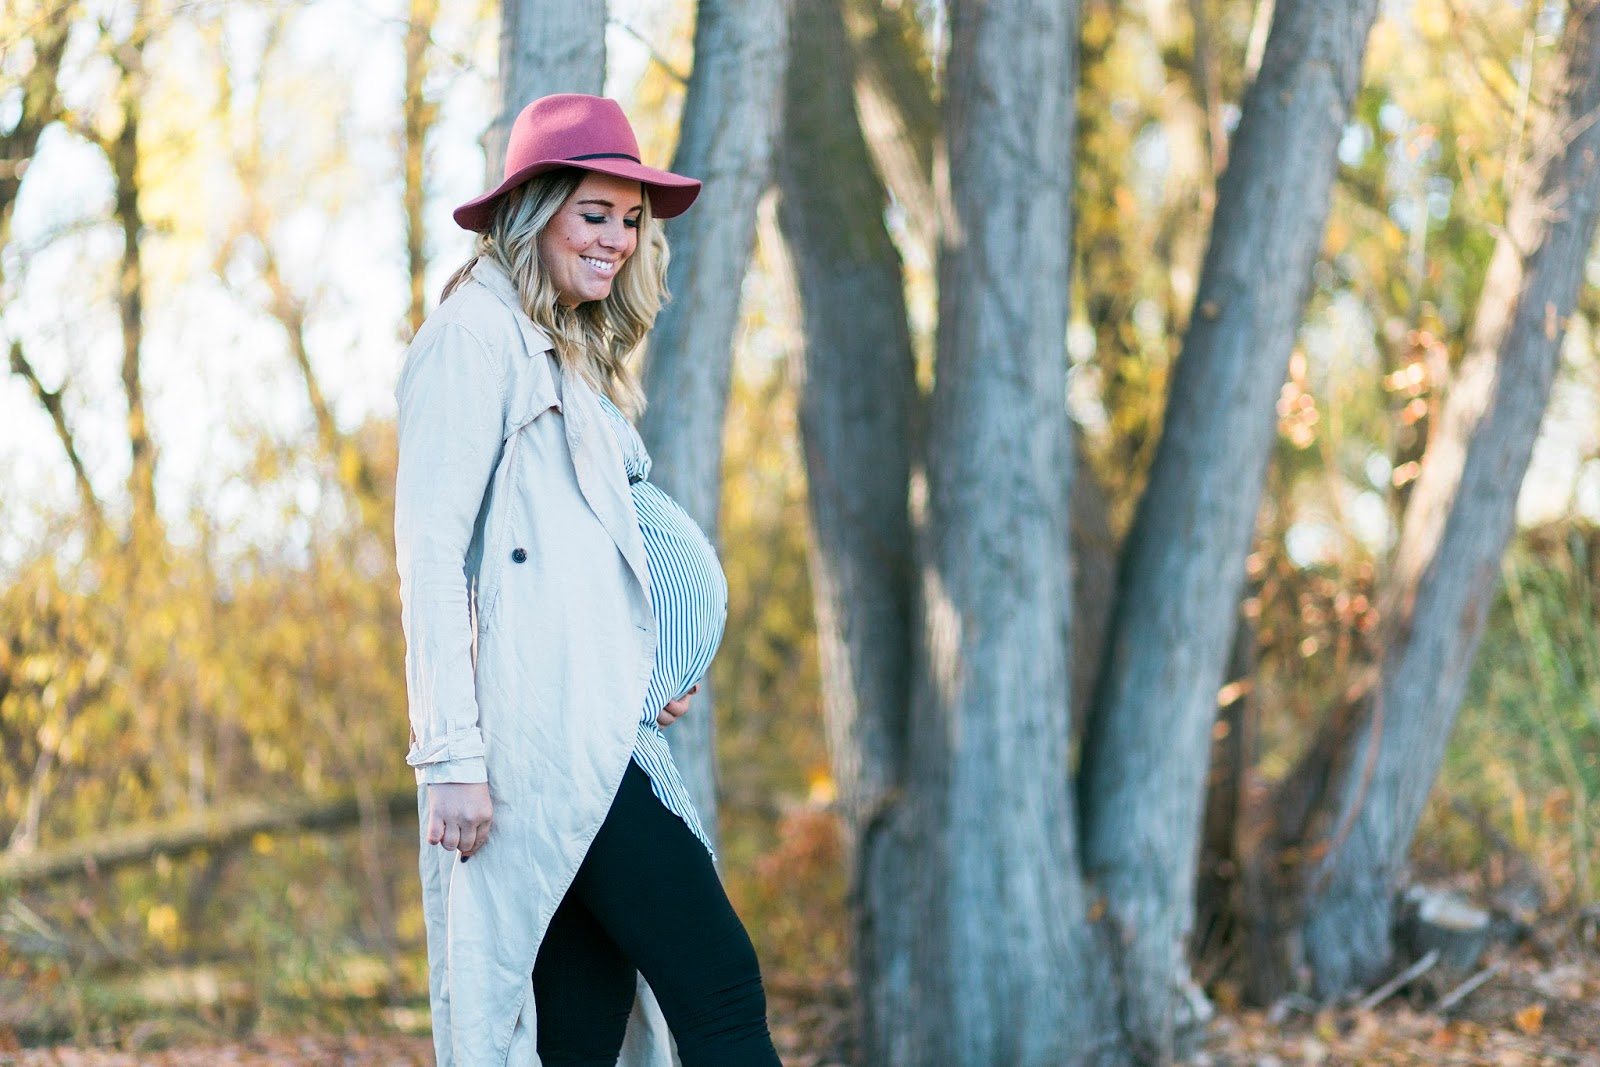 utah fashion blogger, modest fashion blogger, trench coat